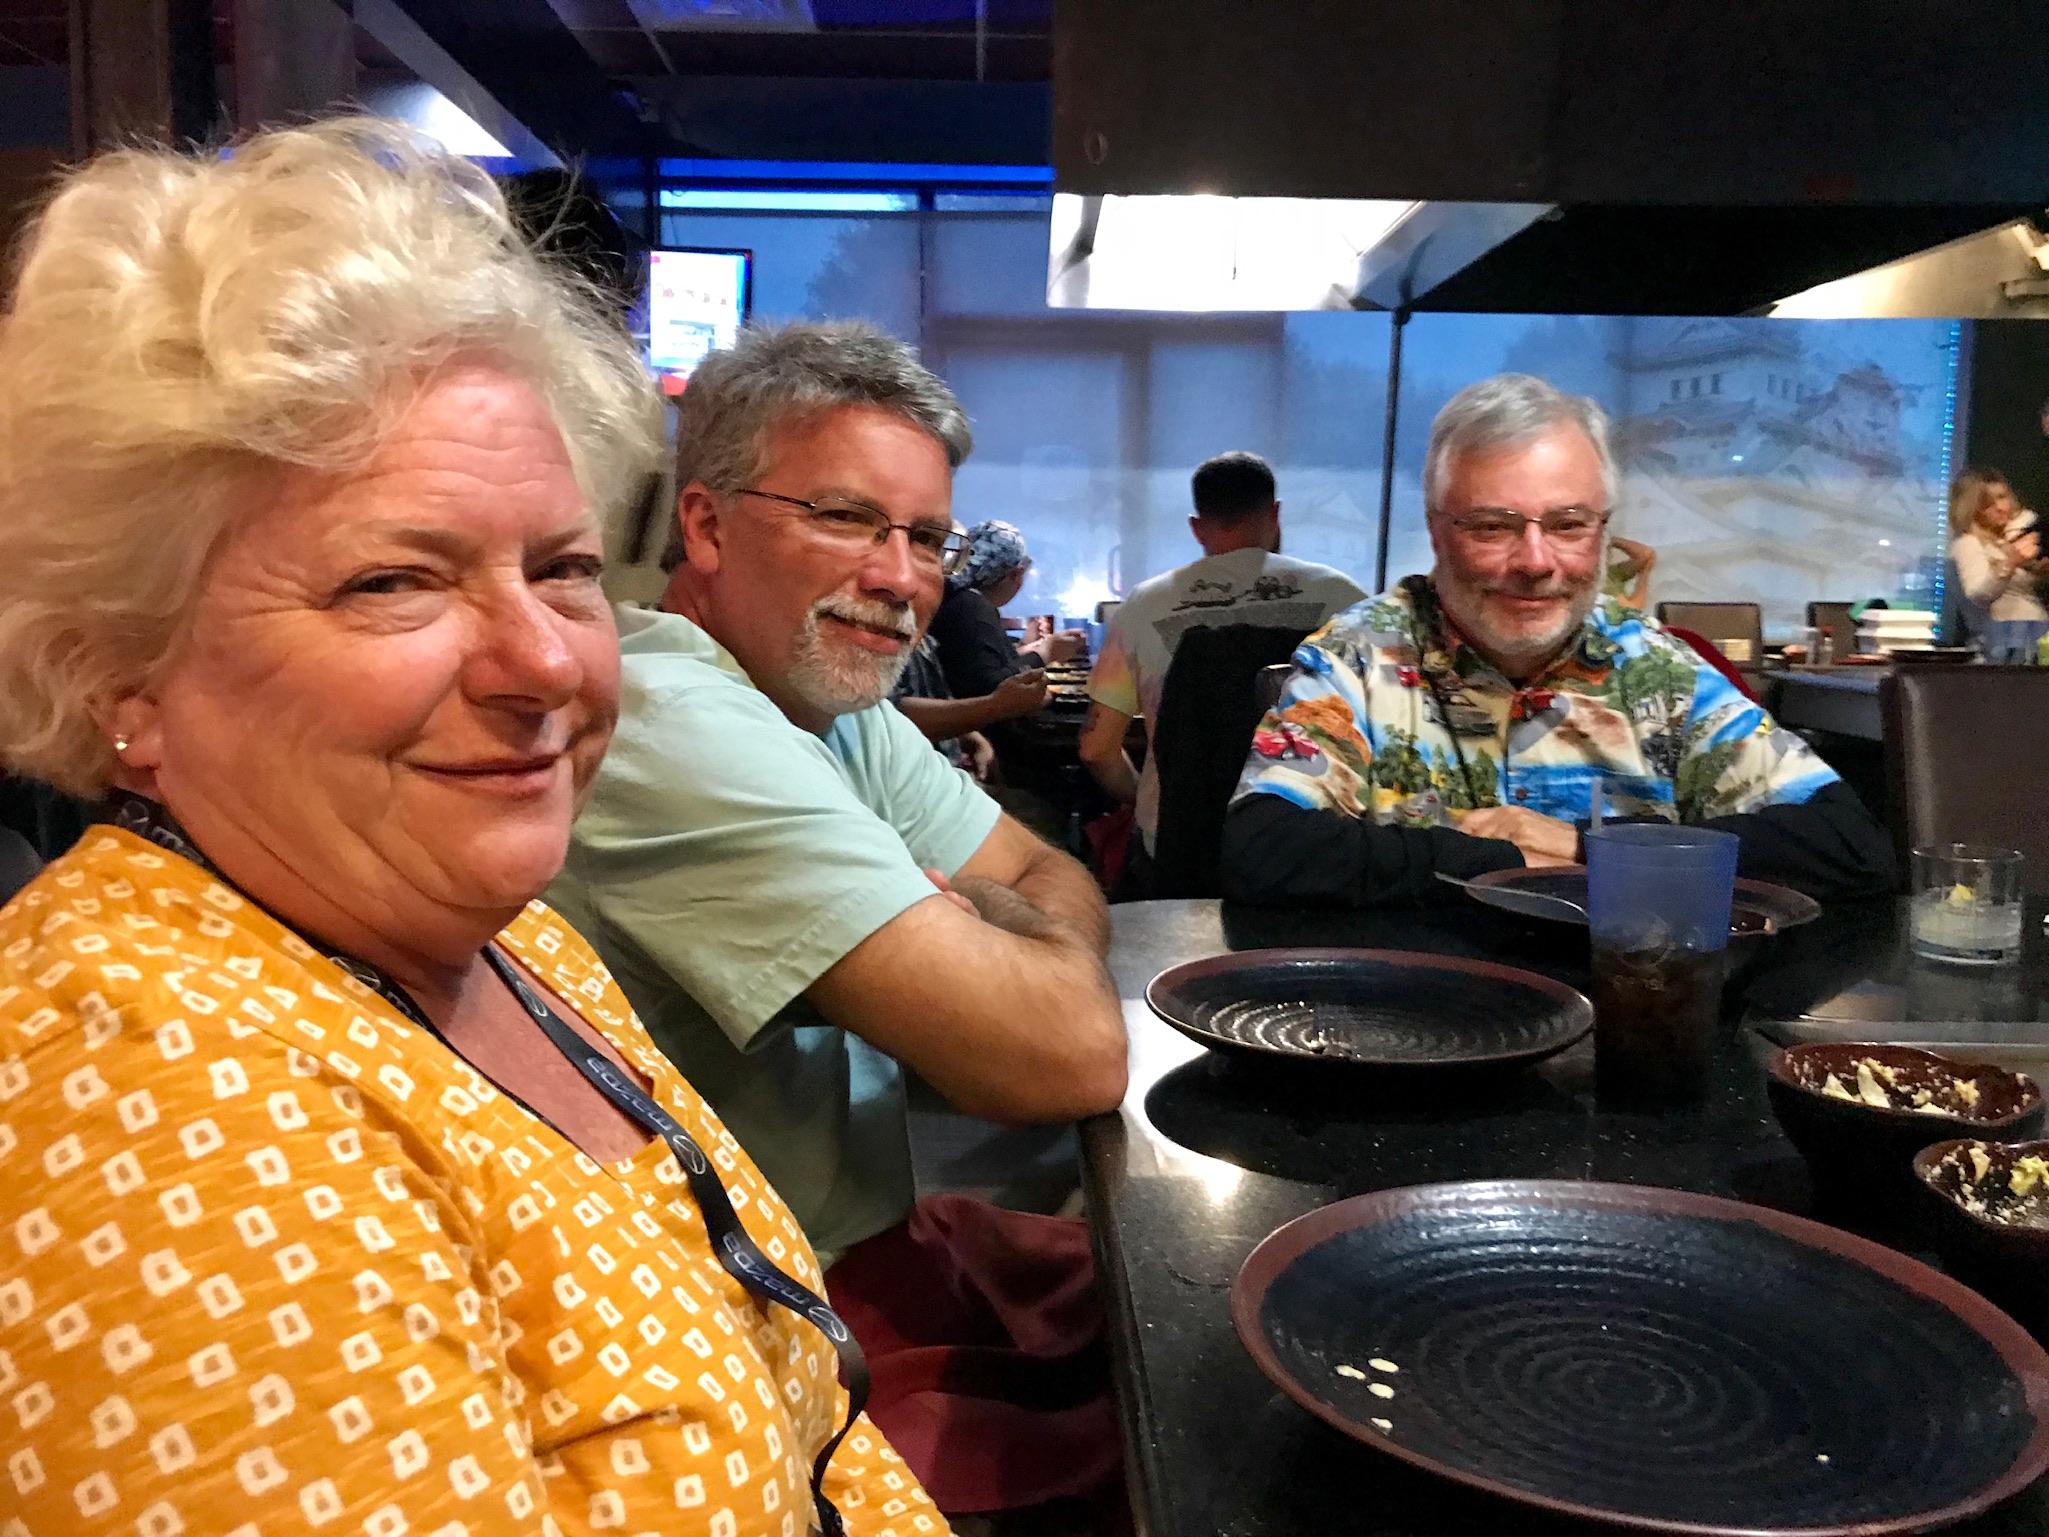 Tena & Lee Hough and Bill Mashburn enjoying their meal at Tokyo Japanese Restaurant